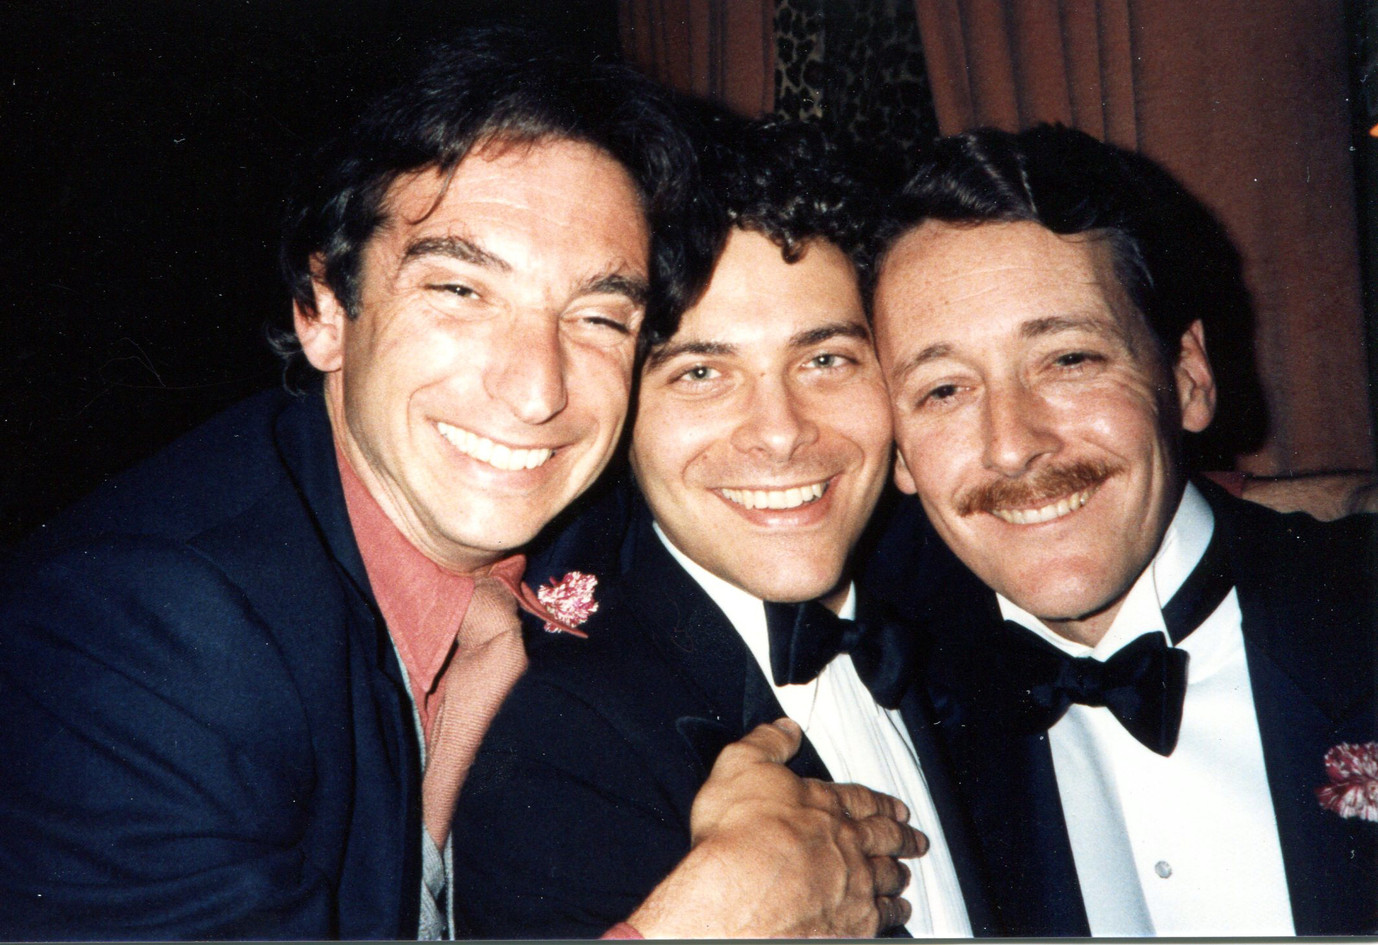 With Michael Tilson Thomas, Michael Feinstein